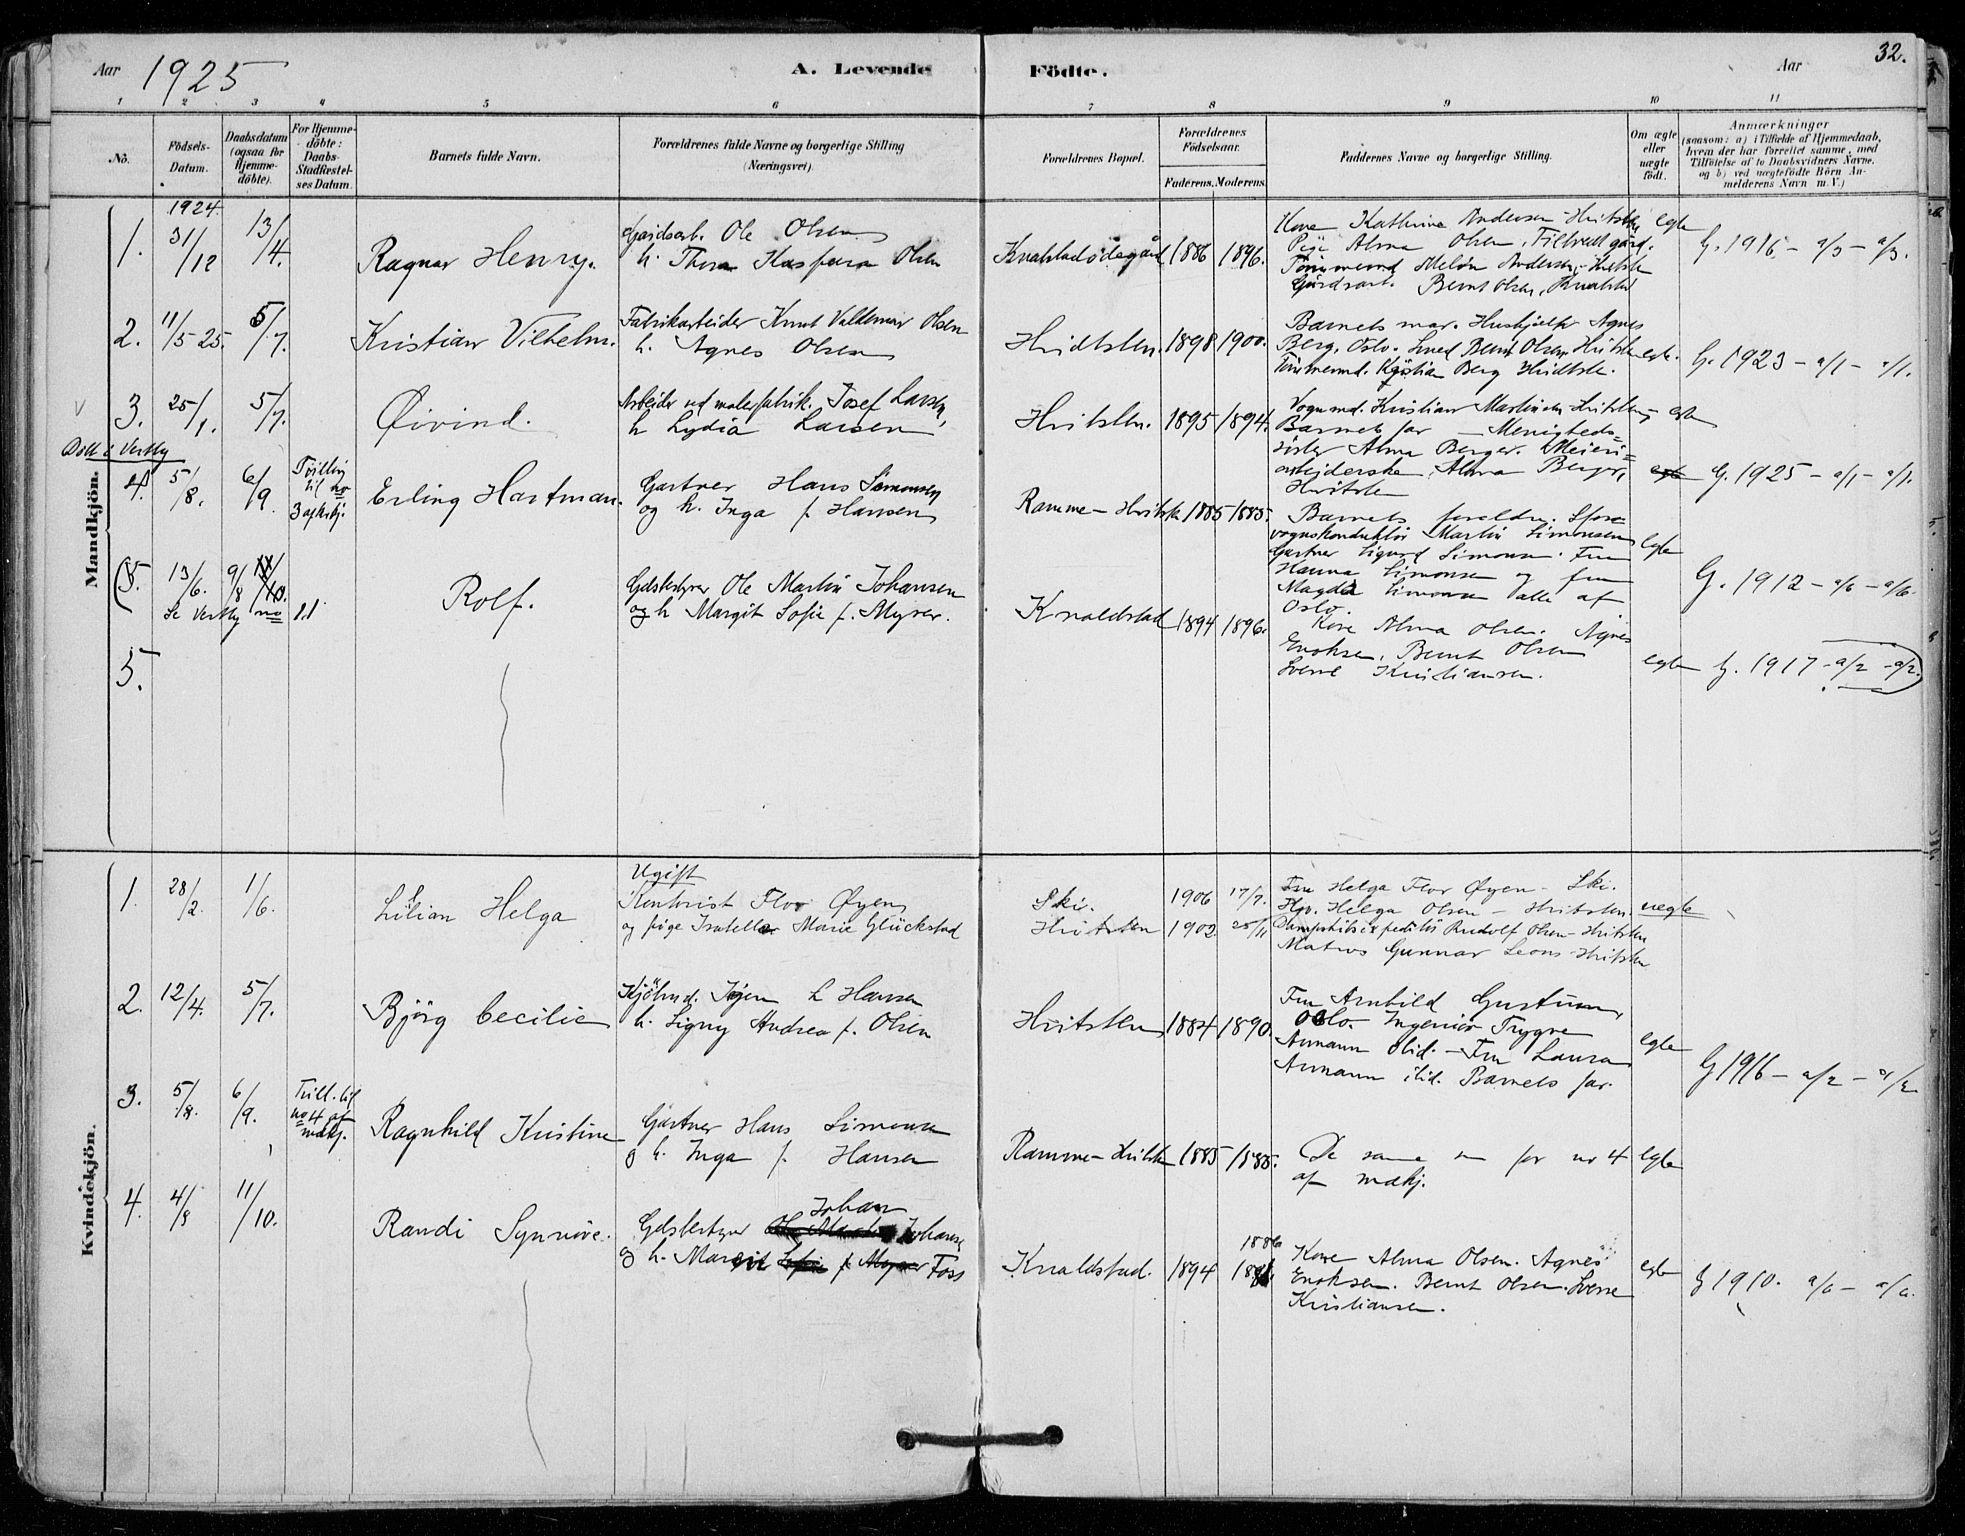 SAO, Vestby prestekontor Kirkebøker, F/Fd/L0001: Ministerialbok nr. IV 1, 1878-1945, s. 32